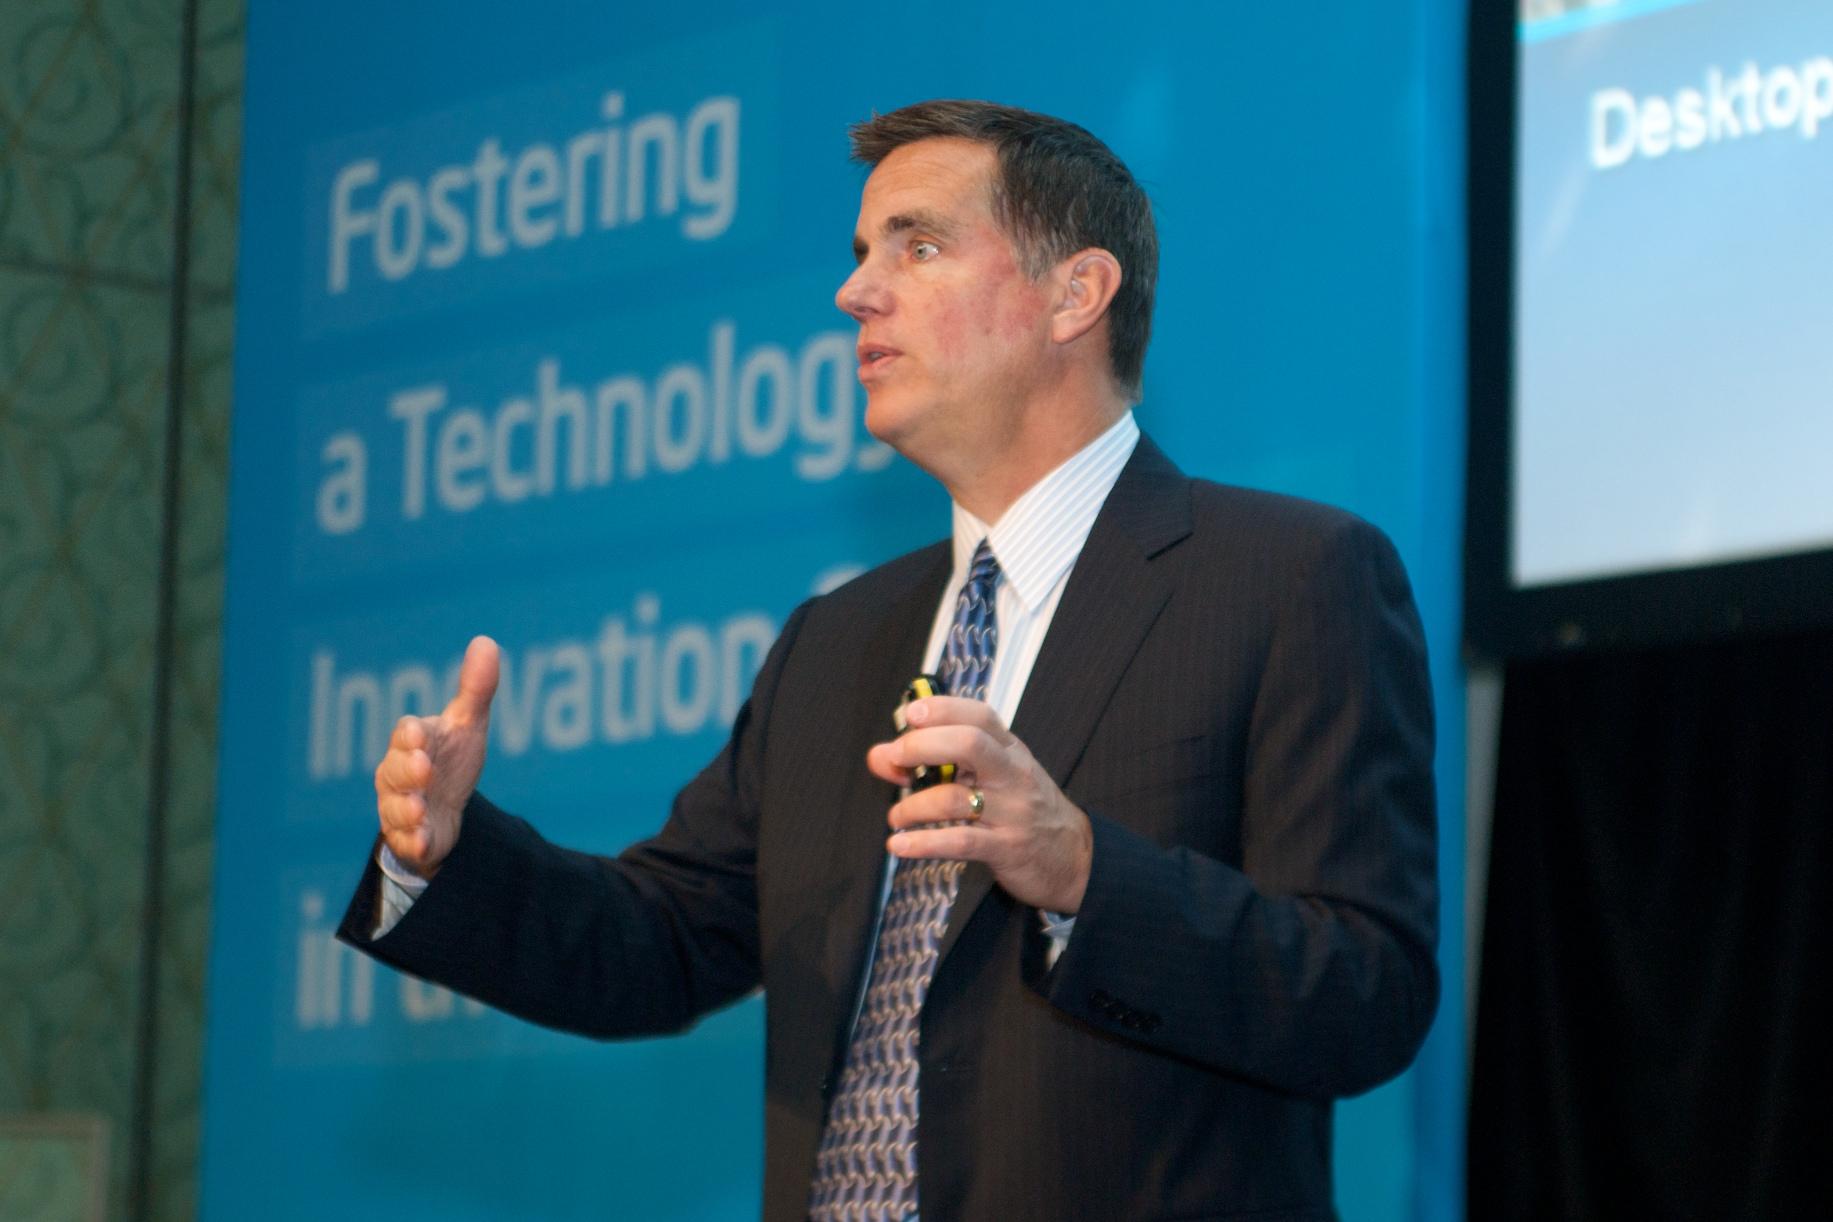 Intel Senior VP Tom Kilroy, DUBAI KEYNOTE, Fostering an Innovation Economy in the Middle East, 27SEP2010.jpg